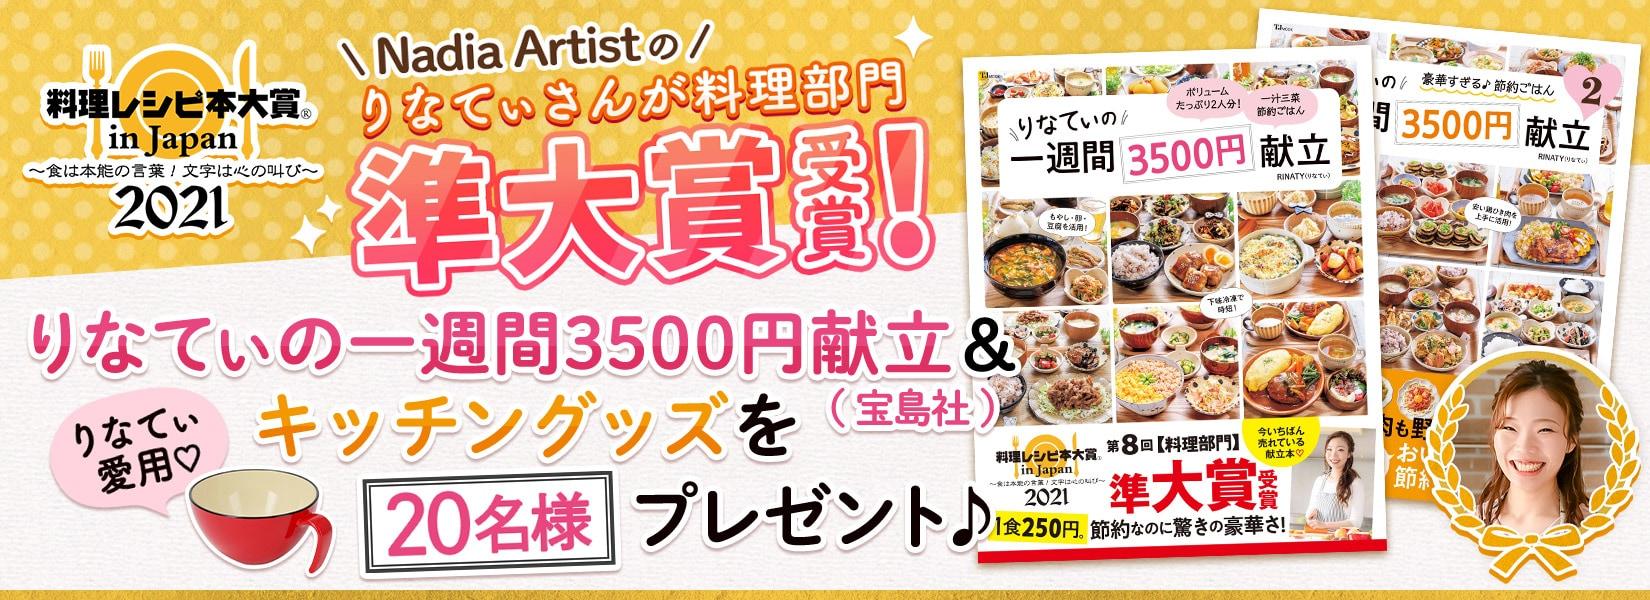 Nadia Artistのりなてぃさんが第8回料理レシピ本大賞 料理部門 準大賞受賞!特別プレゼントキャンペーン